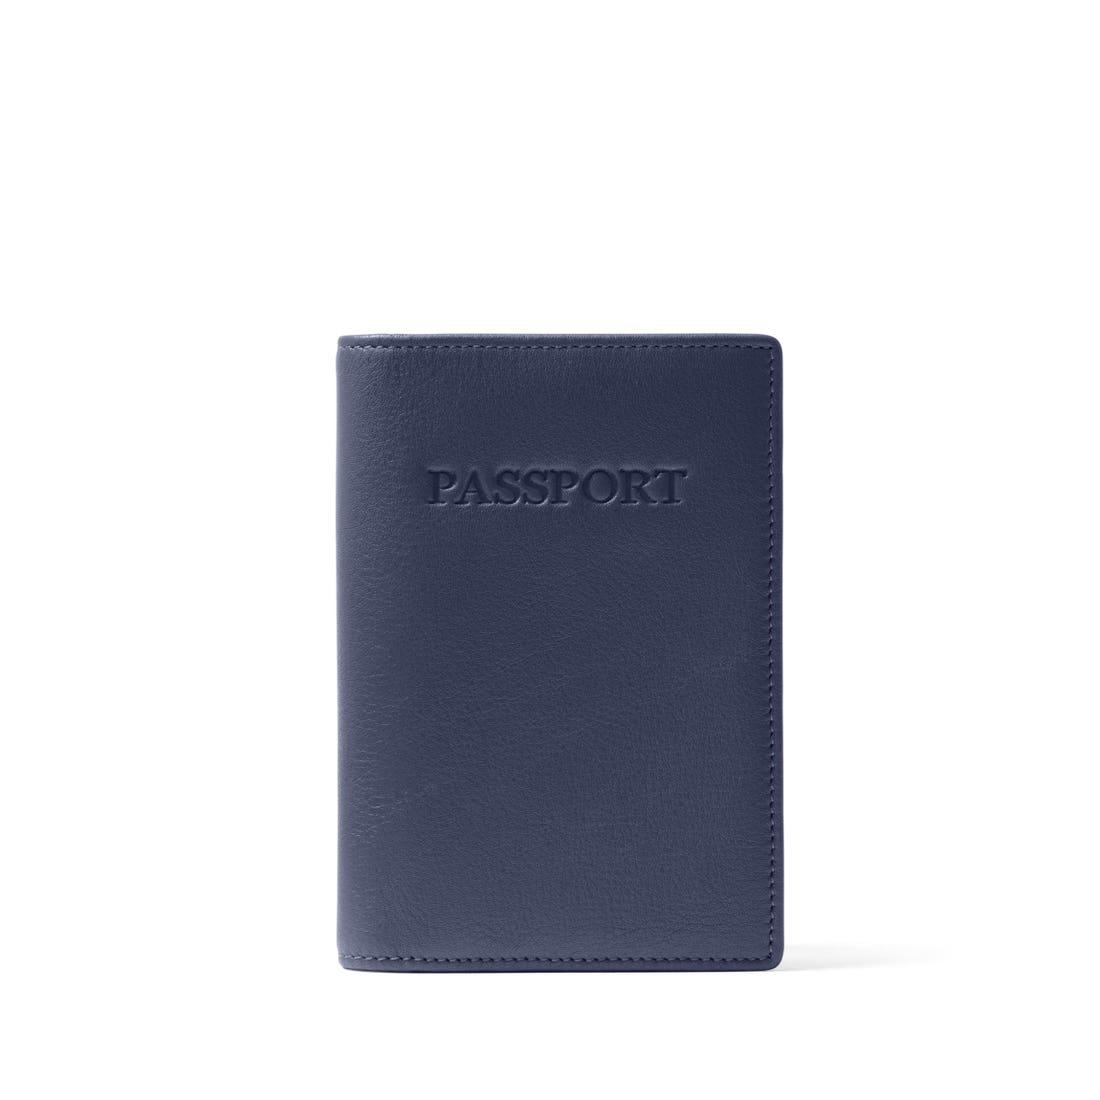 Standard Passport Cover